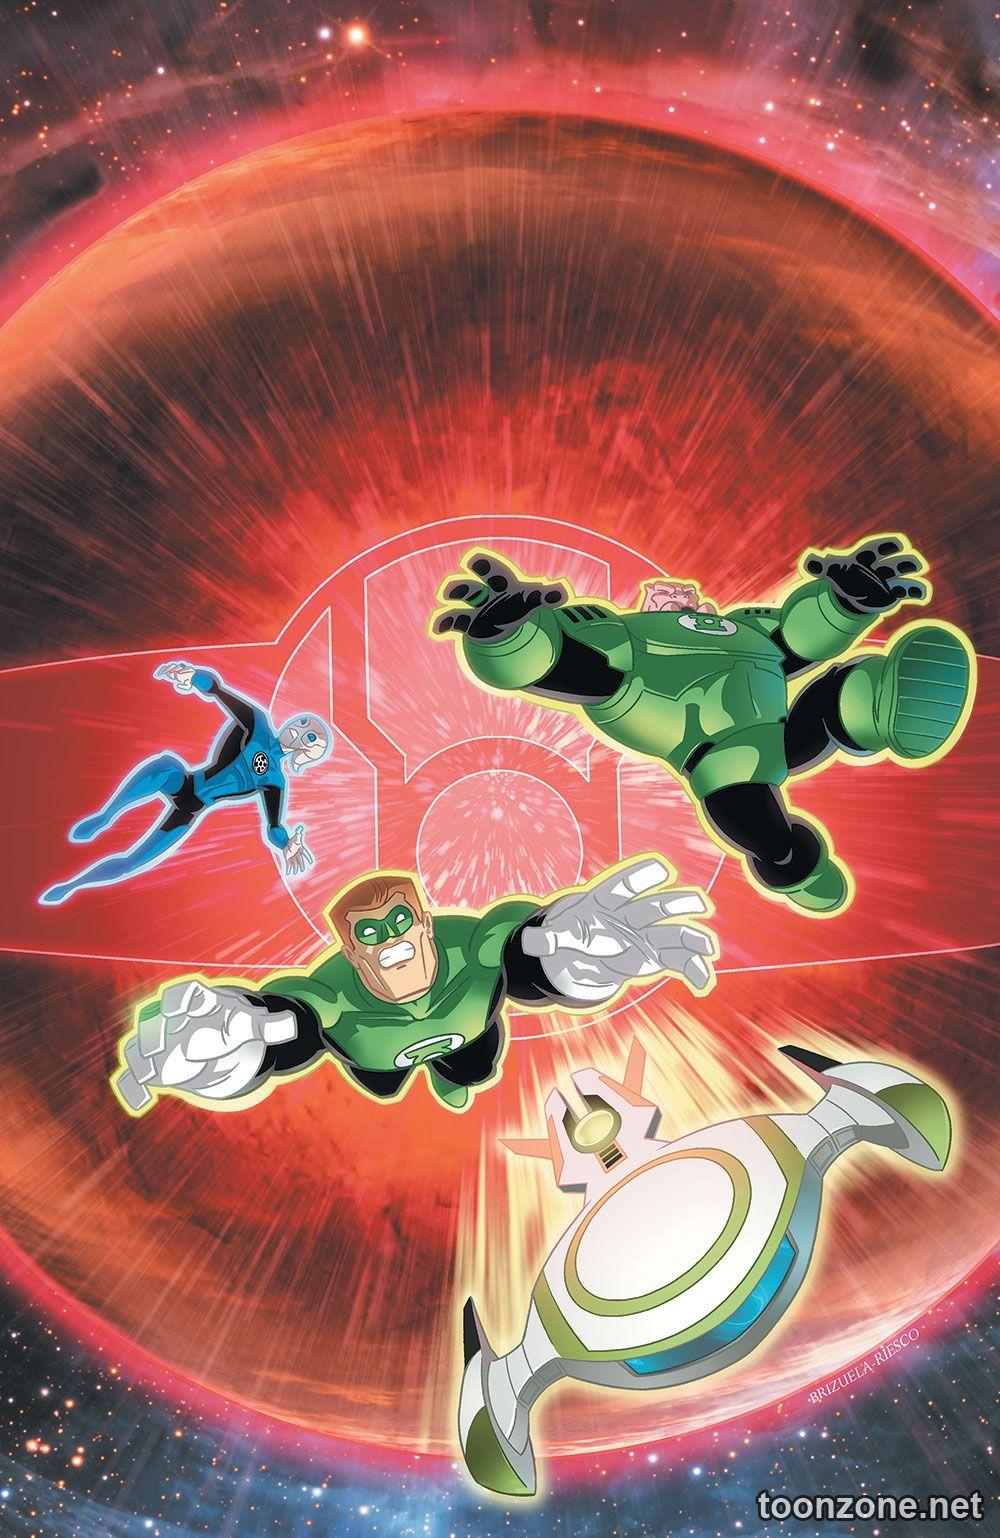 GREEN LANTERN: THE ANIMATED SERIES #12